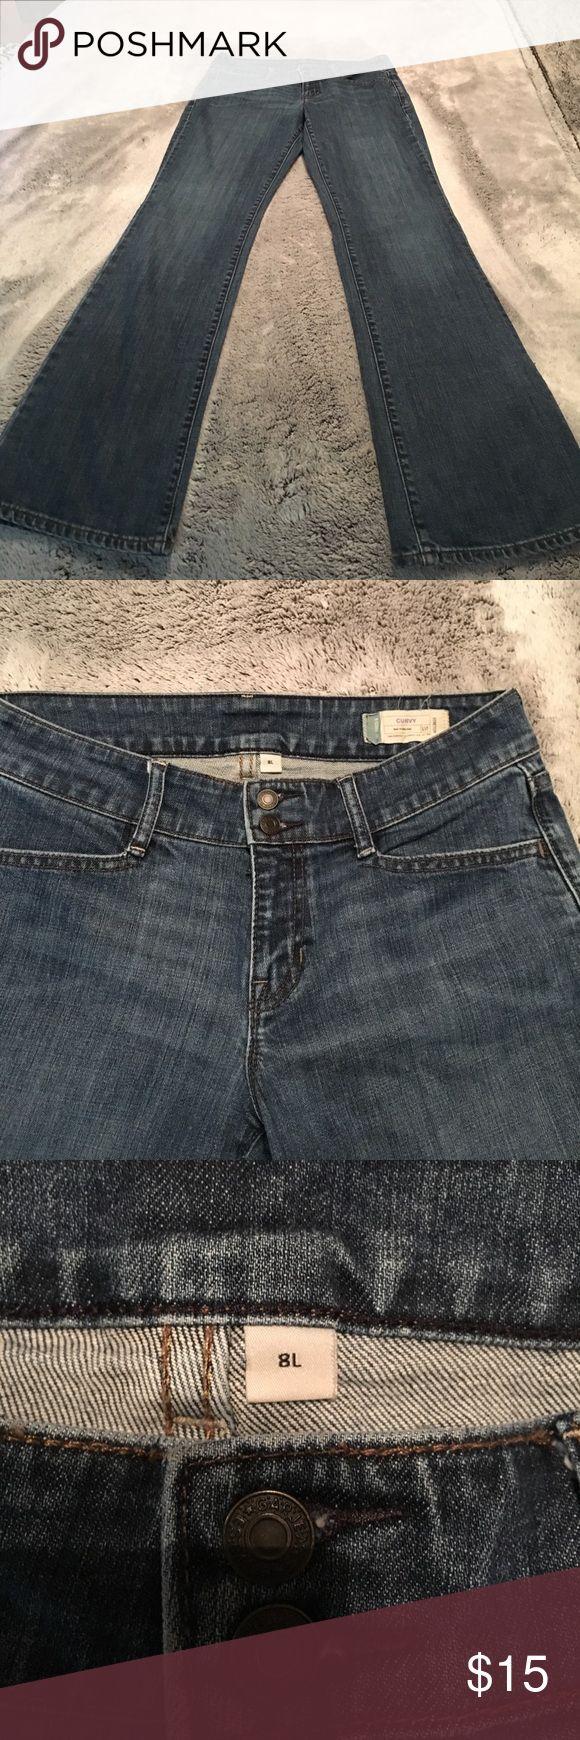 Gap Curvy Jeans 8L EUC No signs of wear at all. Size 8 long Gap Curvy jeans. GAP Jeans Flare & Wide Leg